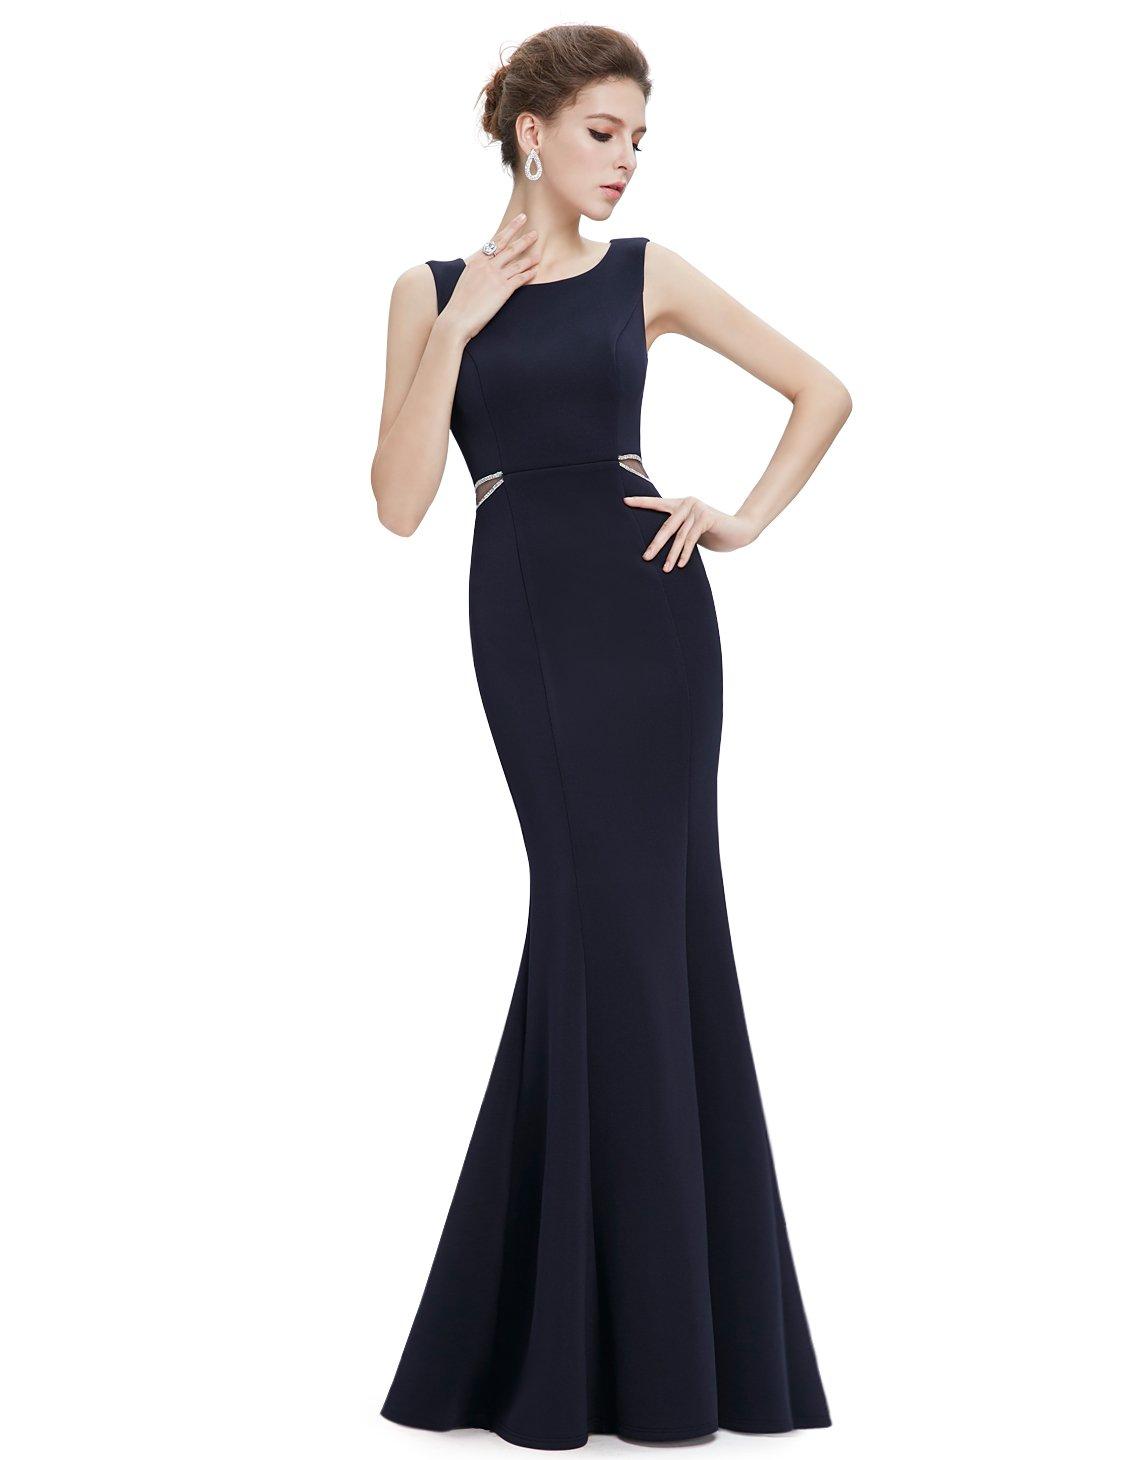 Ever-Pretty Womens Round Neckline Sleeveless Mermaid Style Evening Dress 10 US Midnight Blue